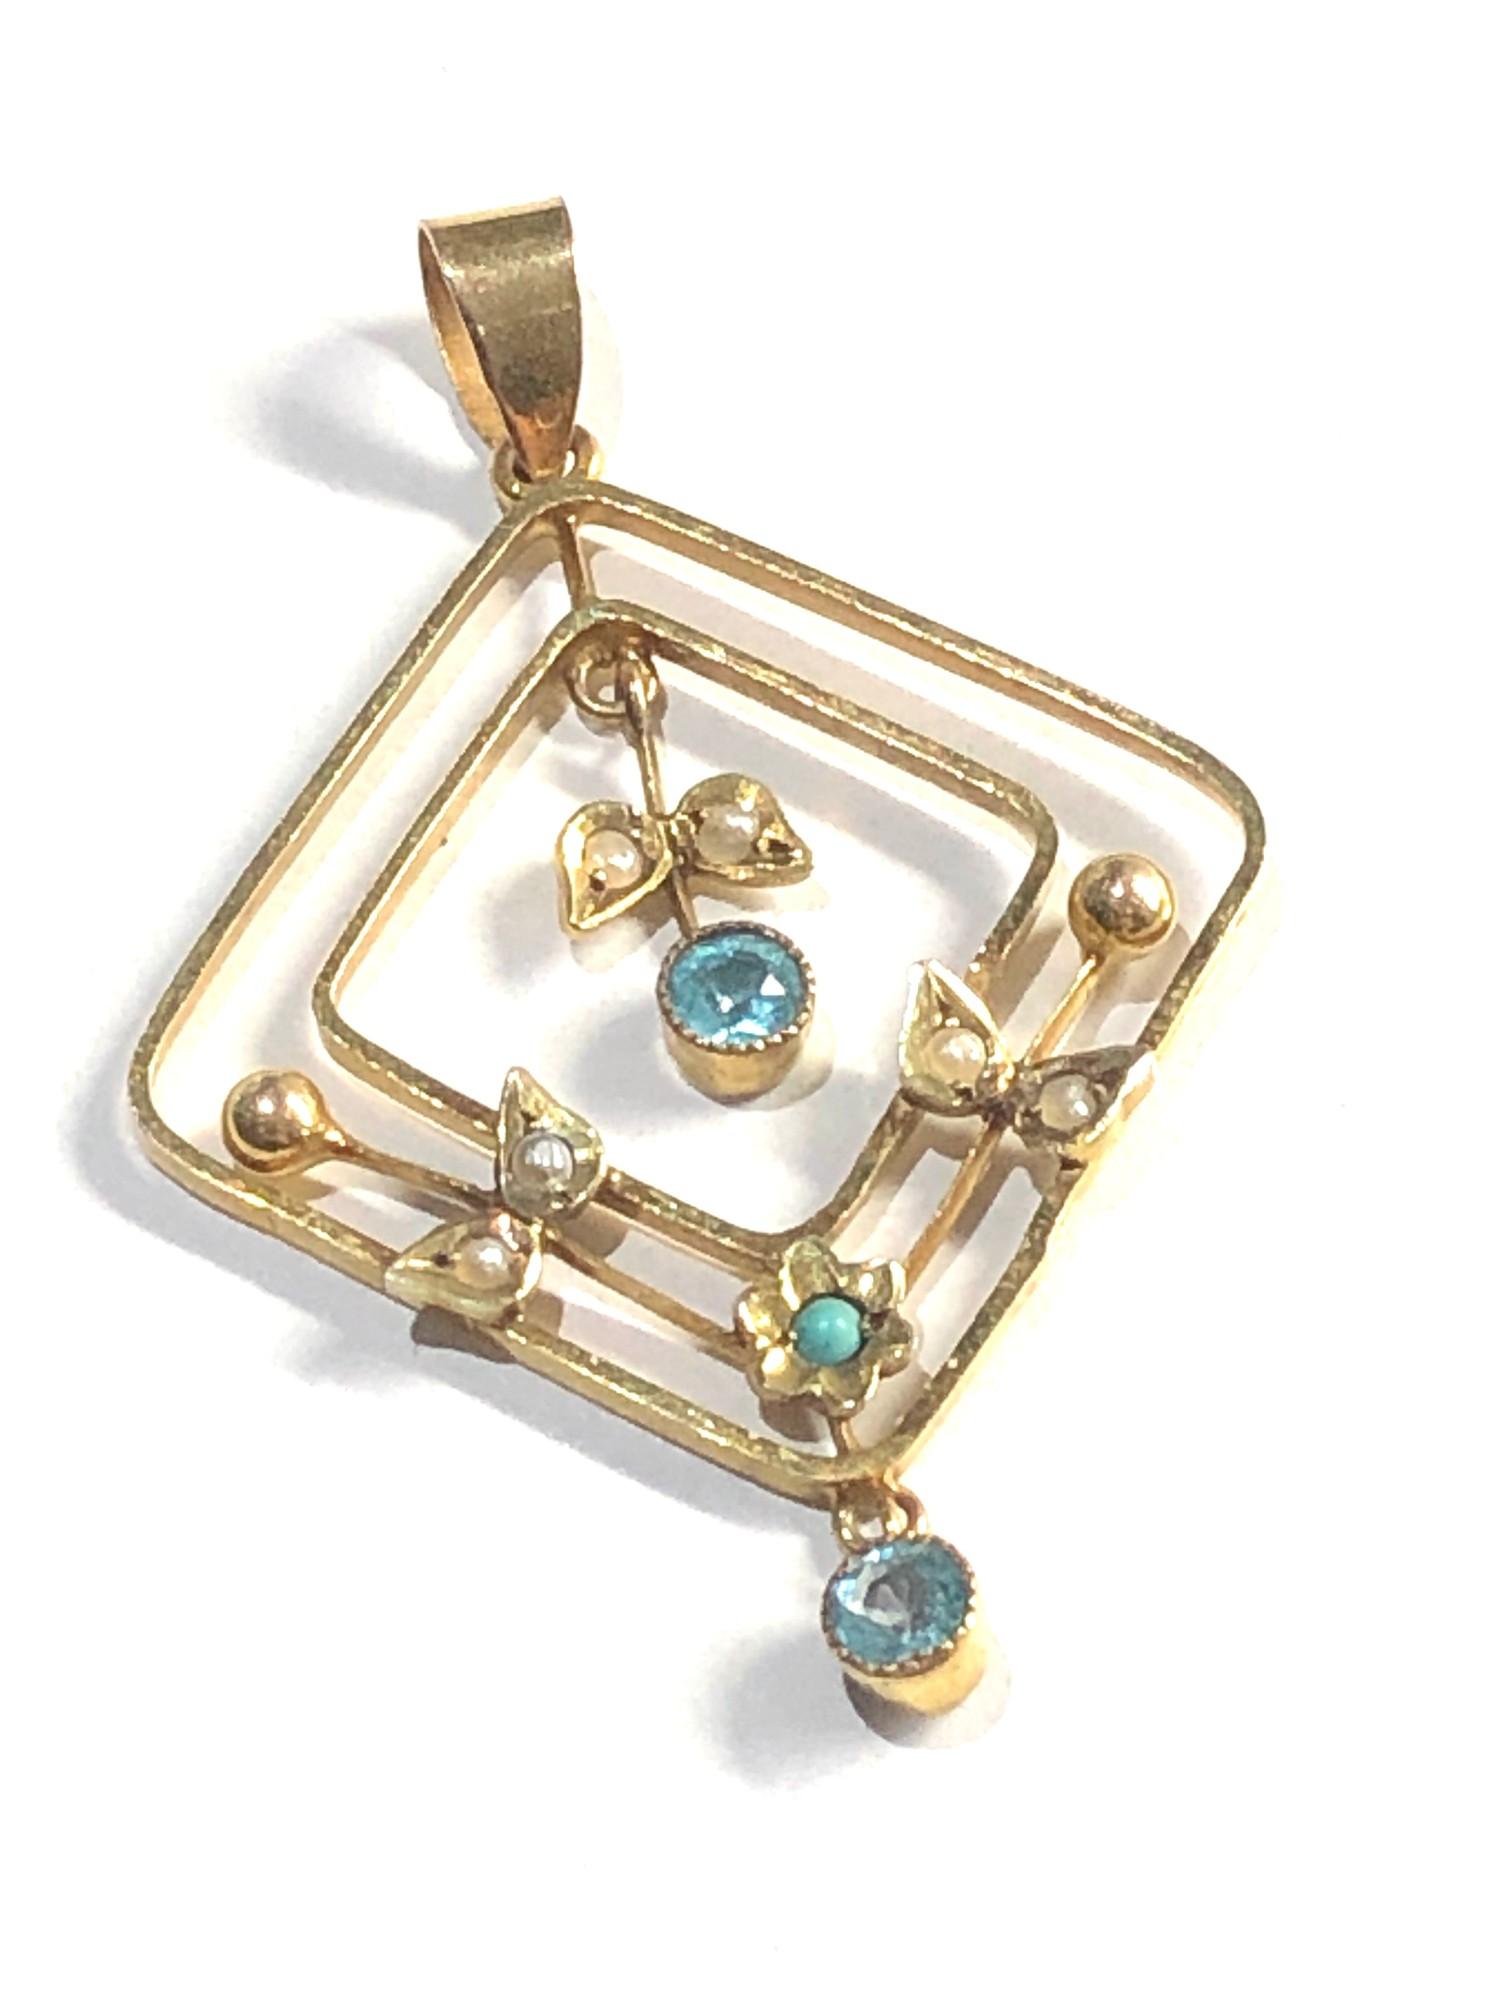 9ct gold antique pendant 2g